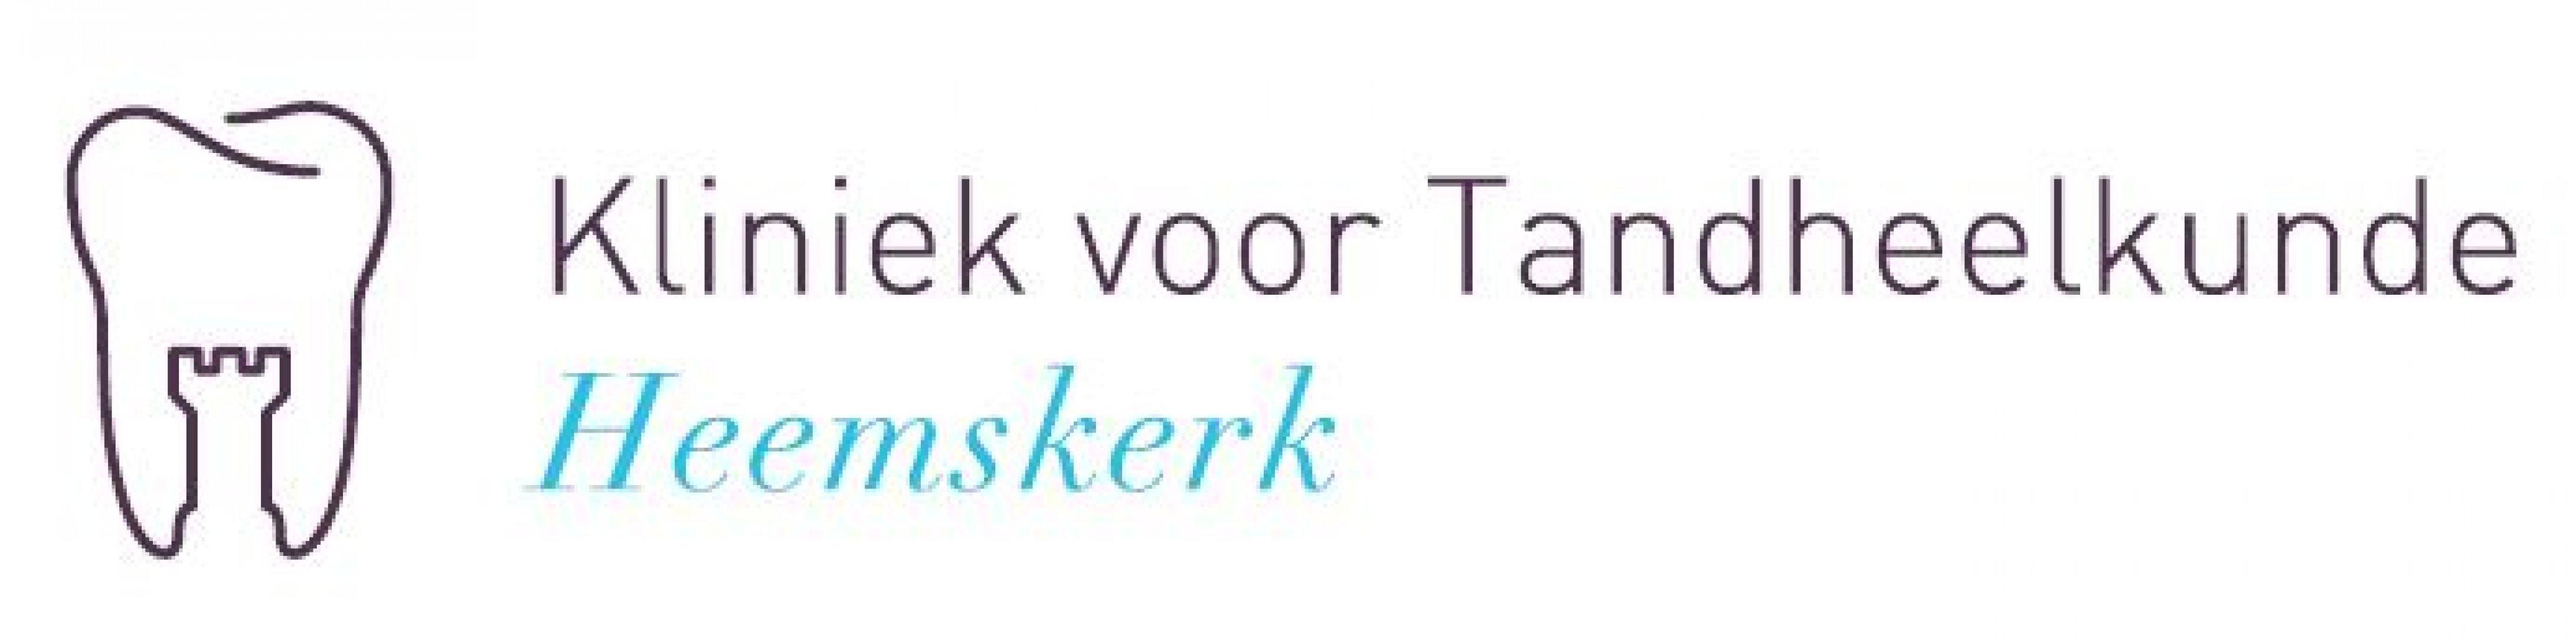 Kliniek voor Tandheelkunde Heemskerk